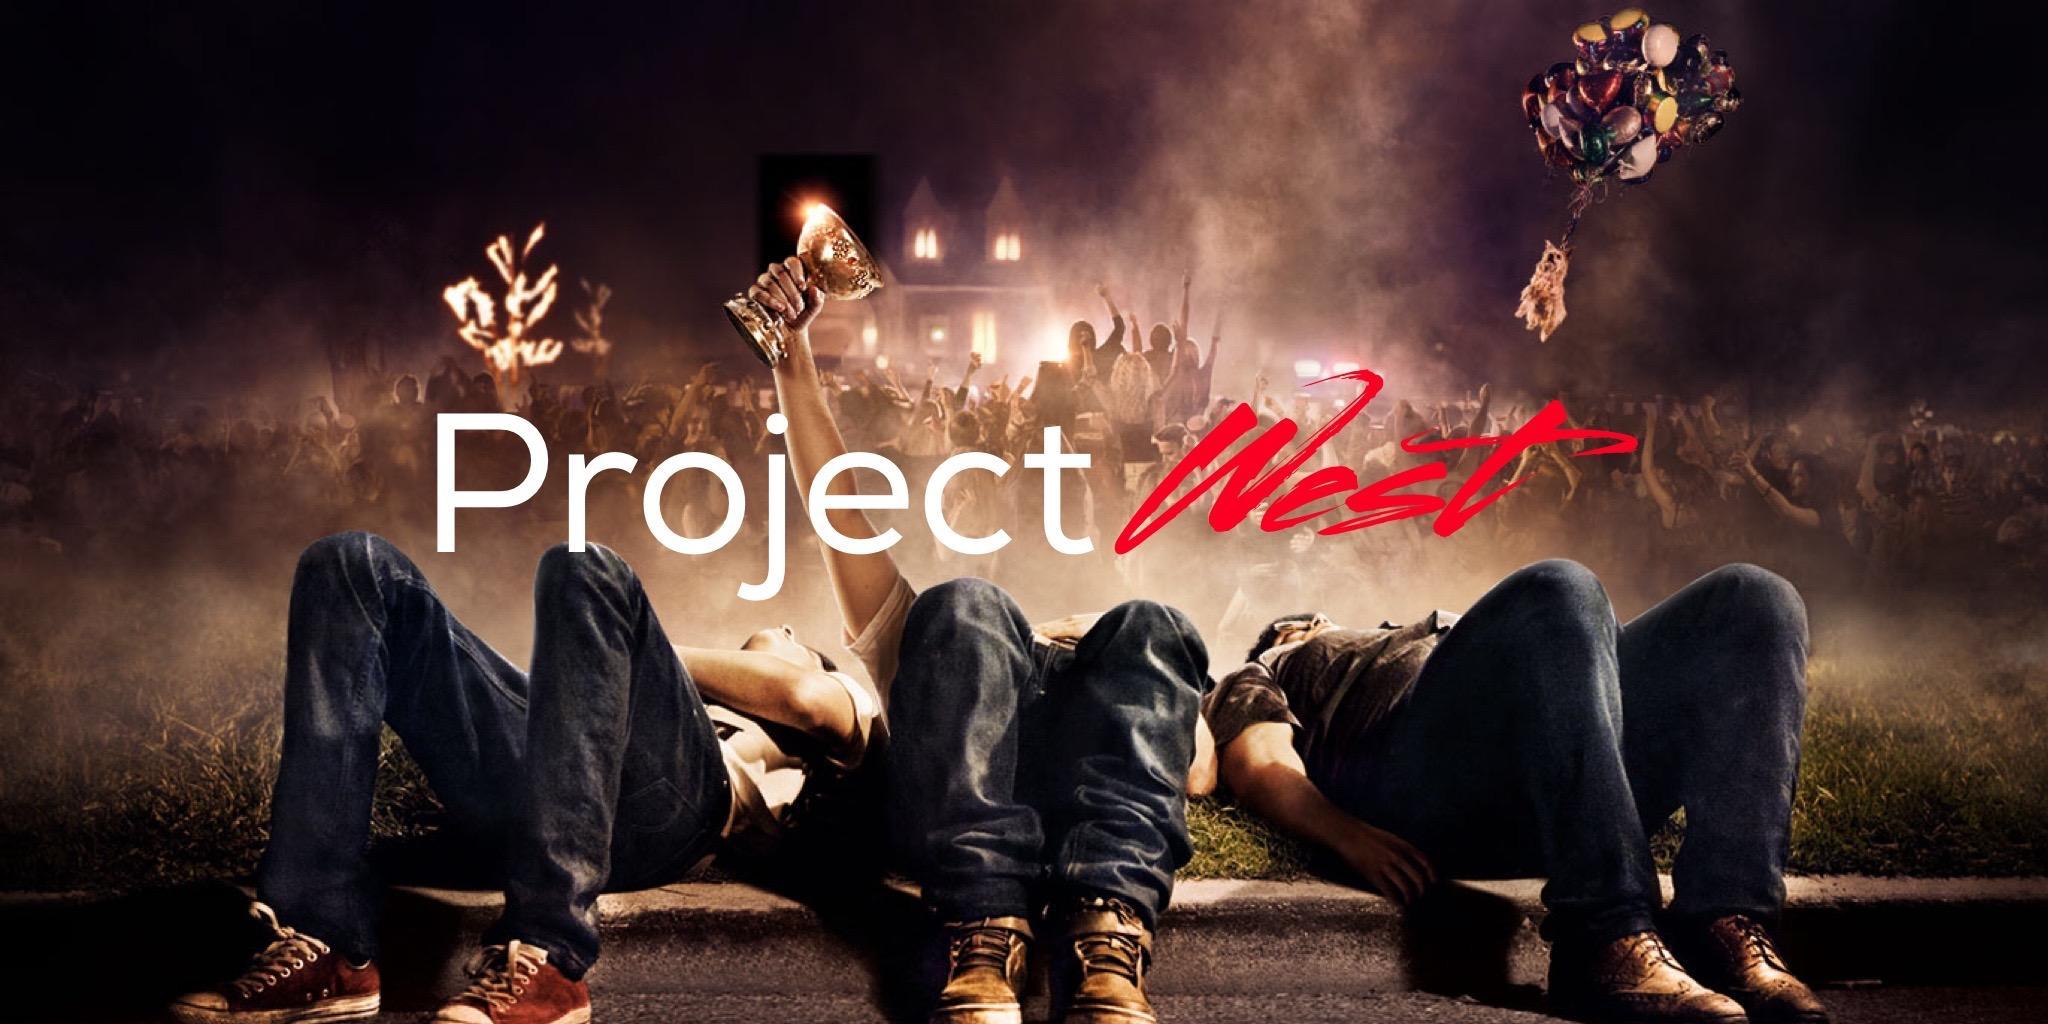 Project West: The Super Flex